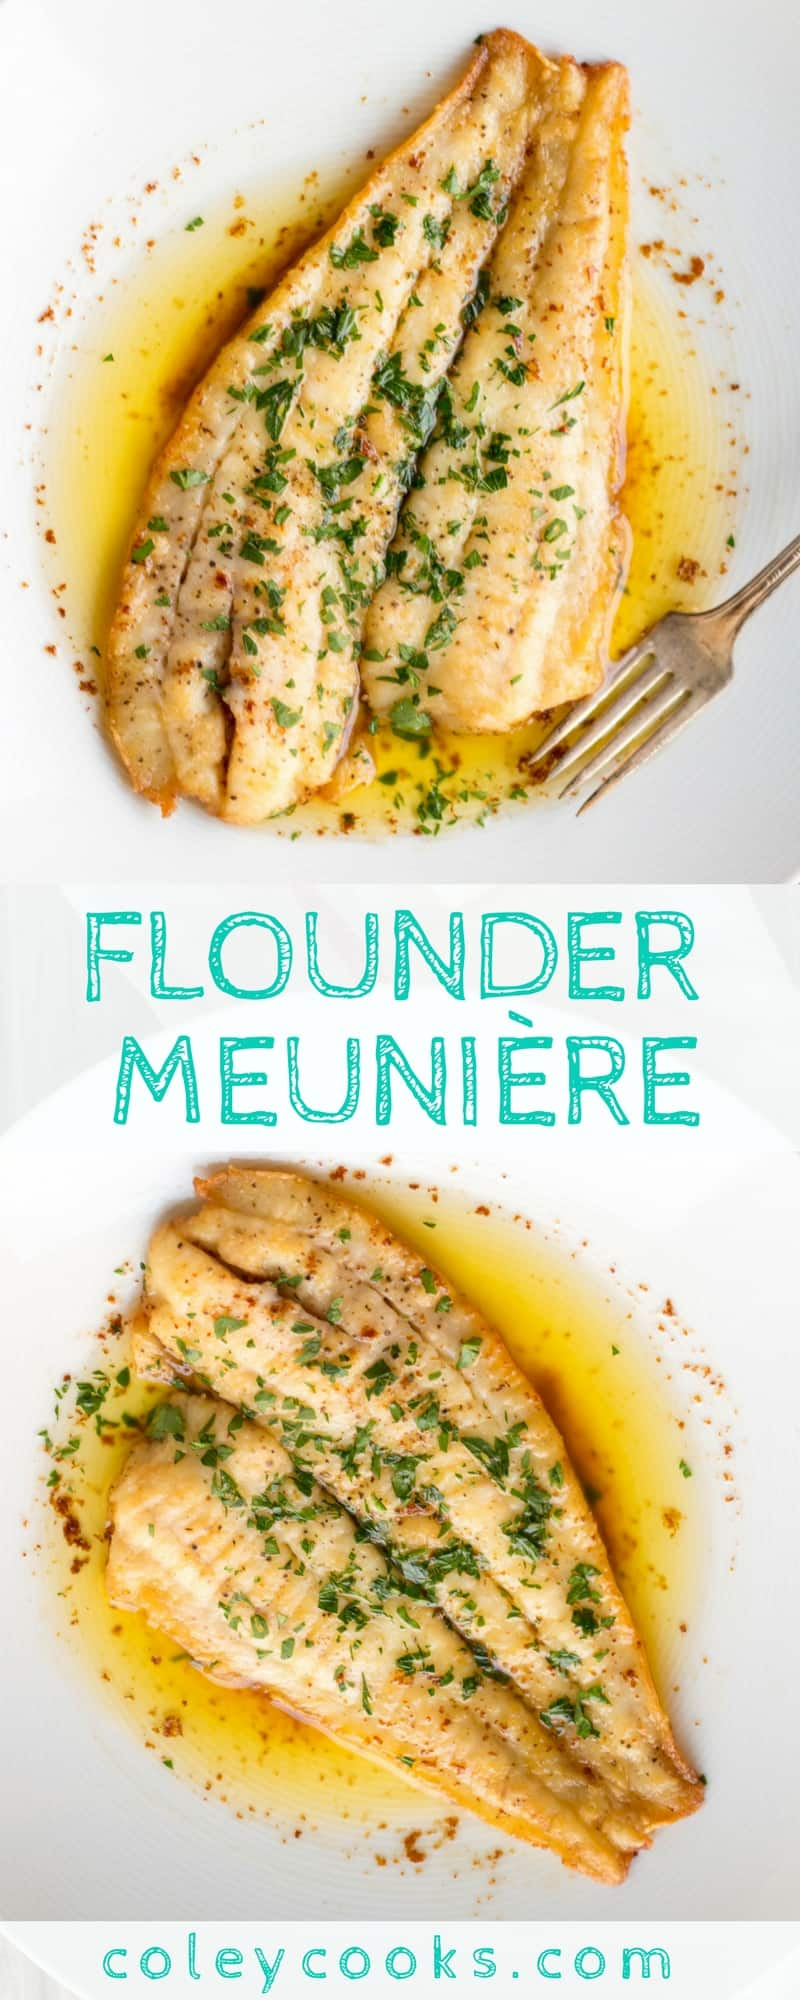 Flounder Meunière Video Coley Cooks